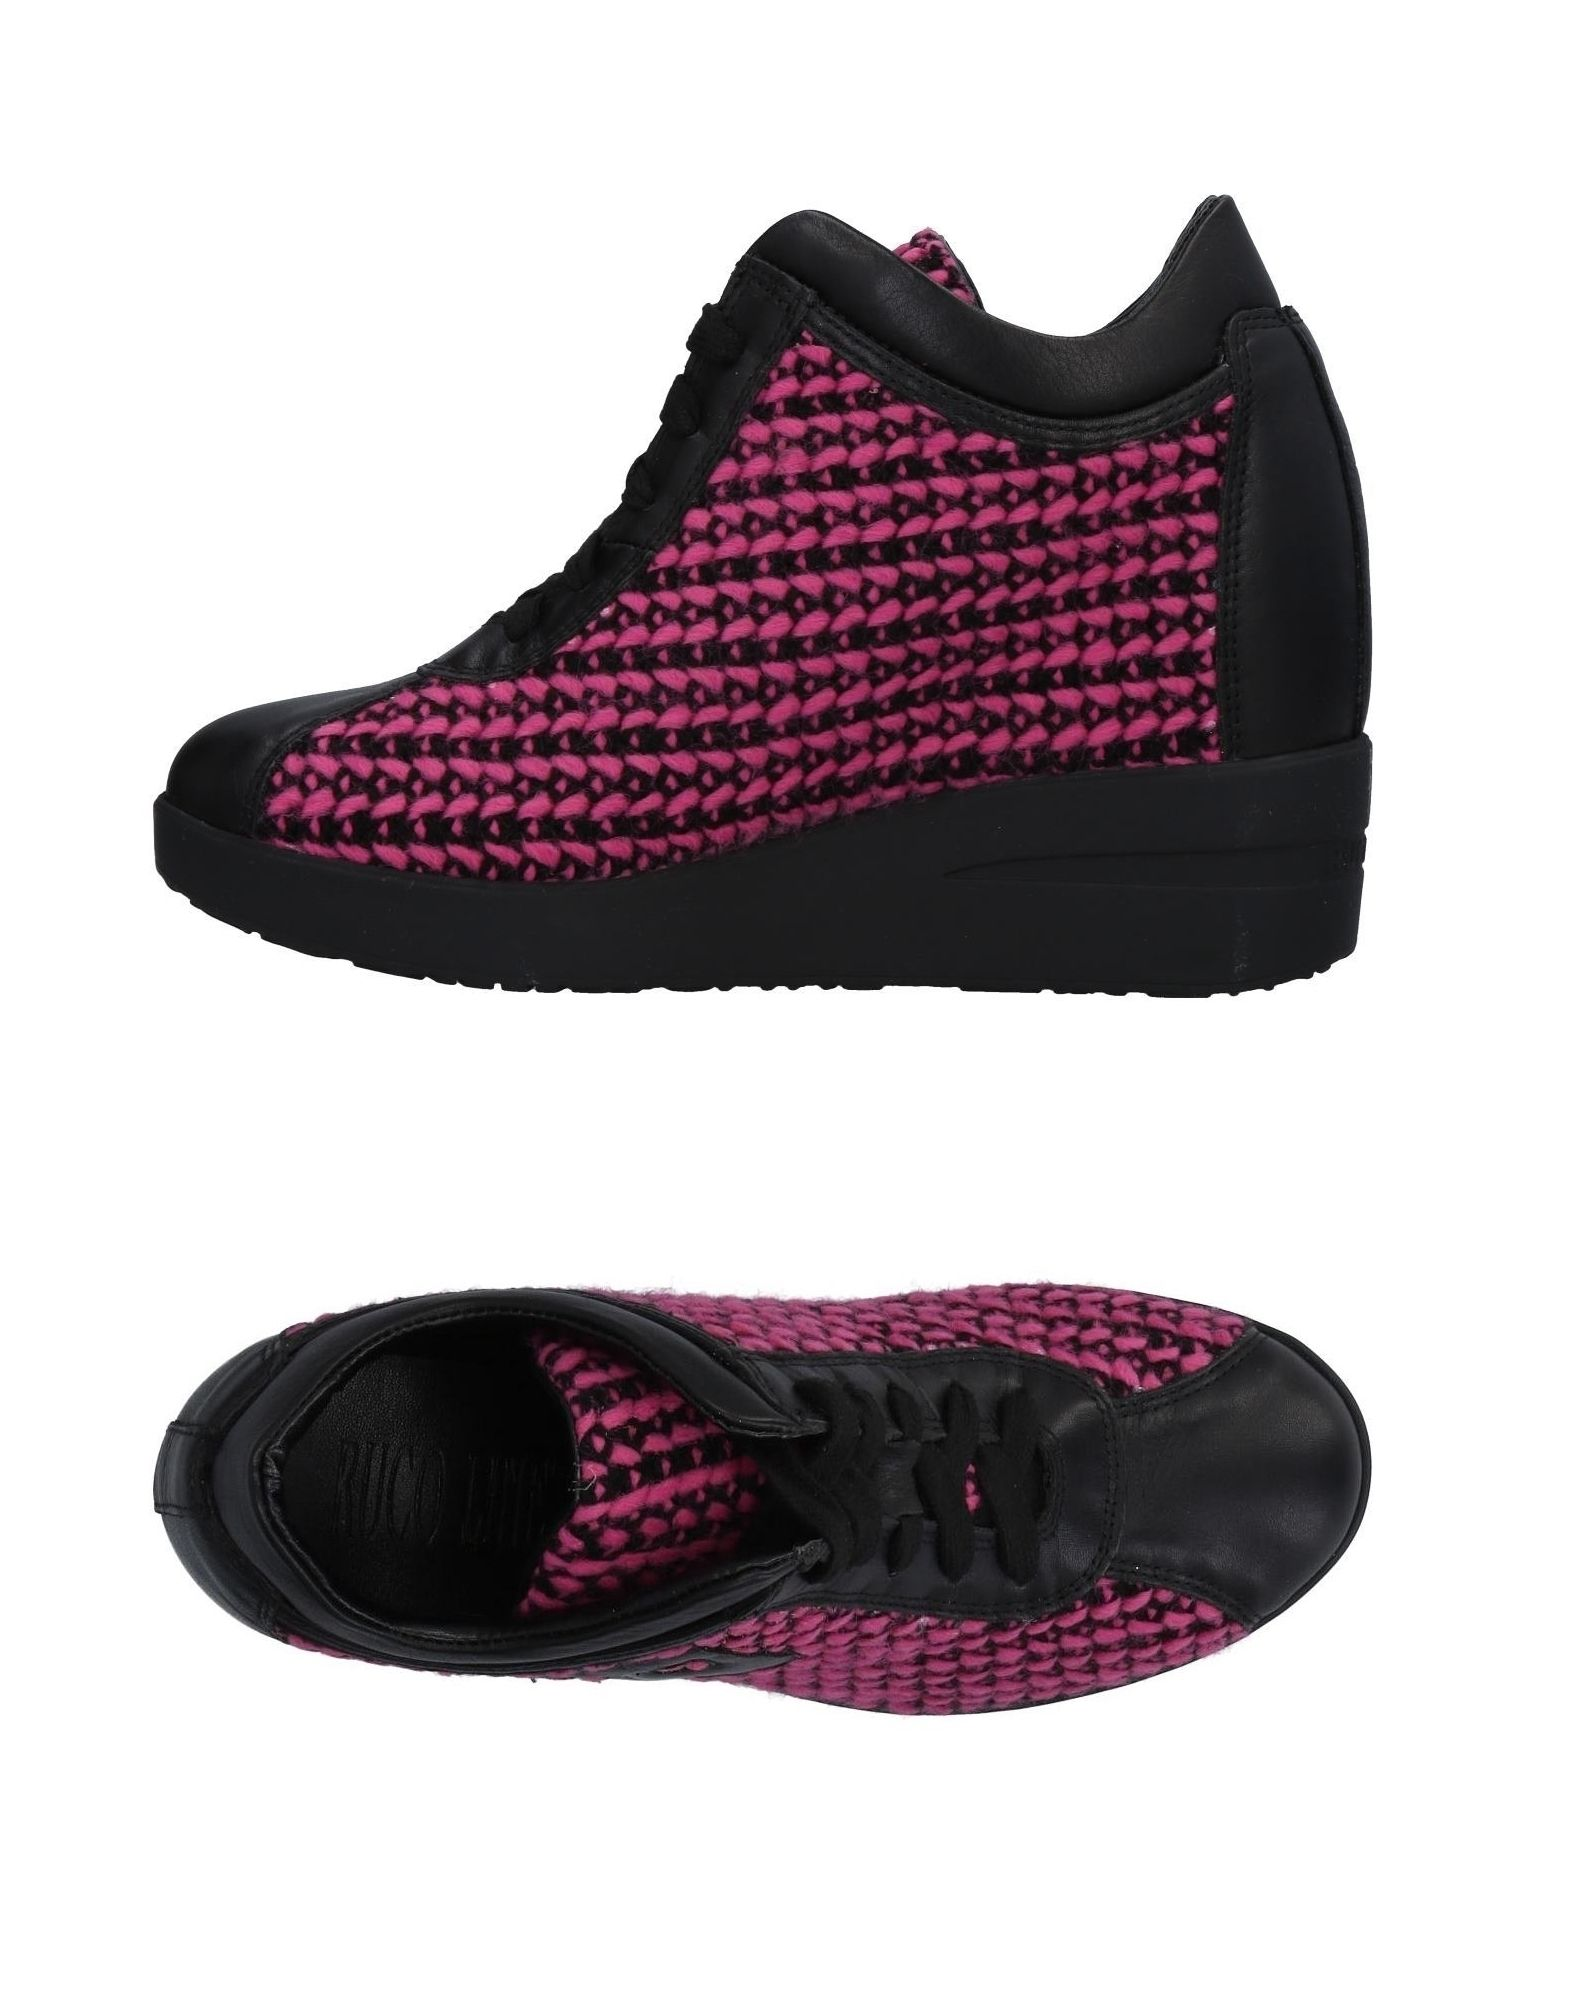 Baskets Ruco Line Femme - Baskets Ruco Line Fuchsia Mode pas cher et belle